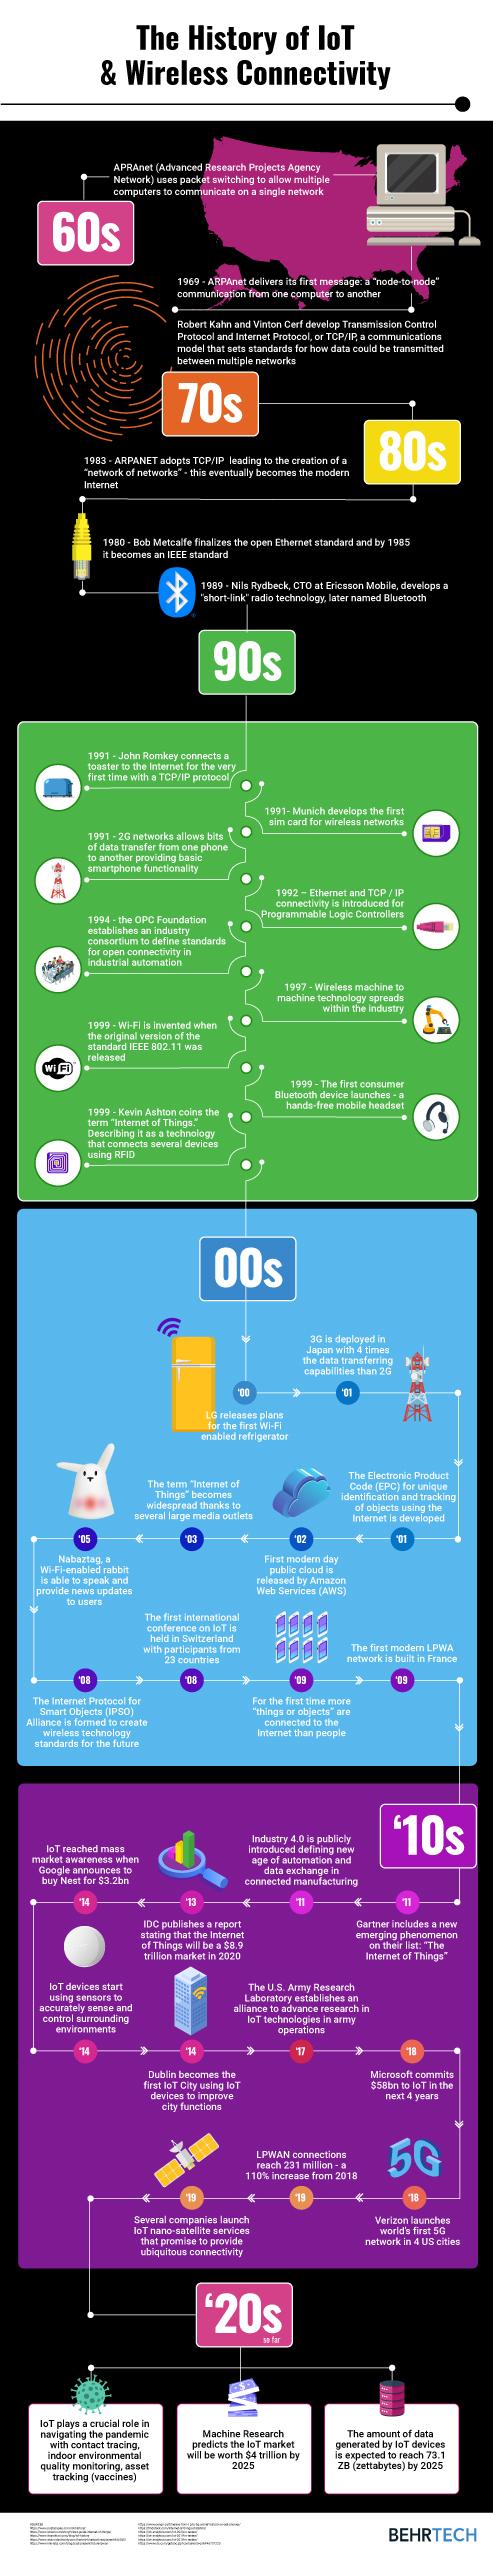 History of IoT